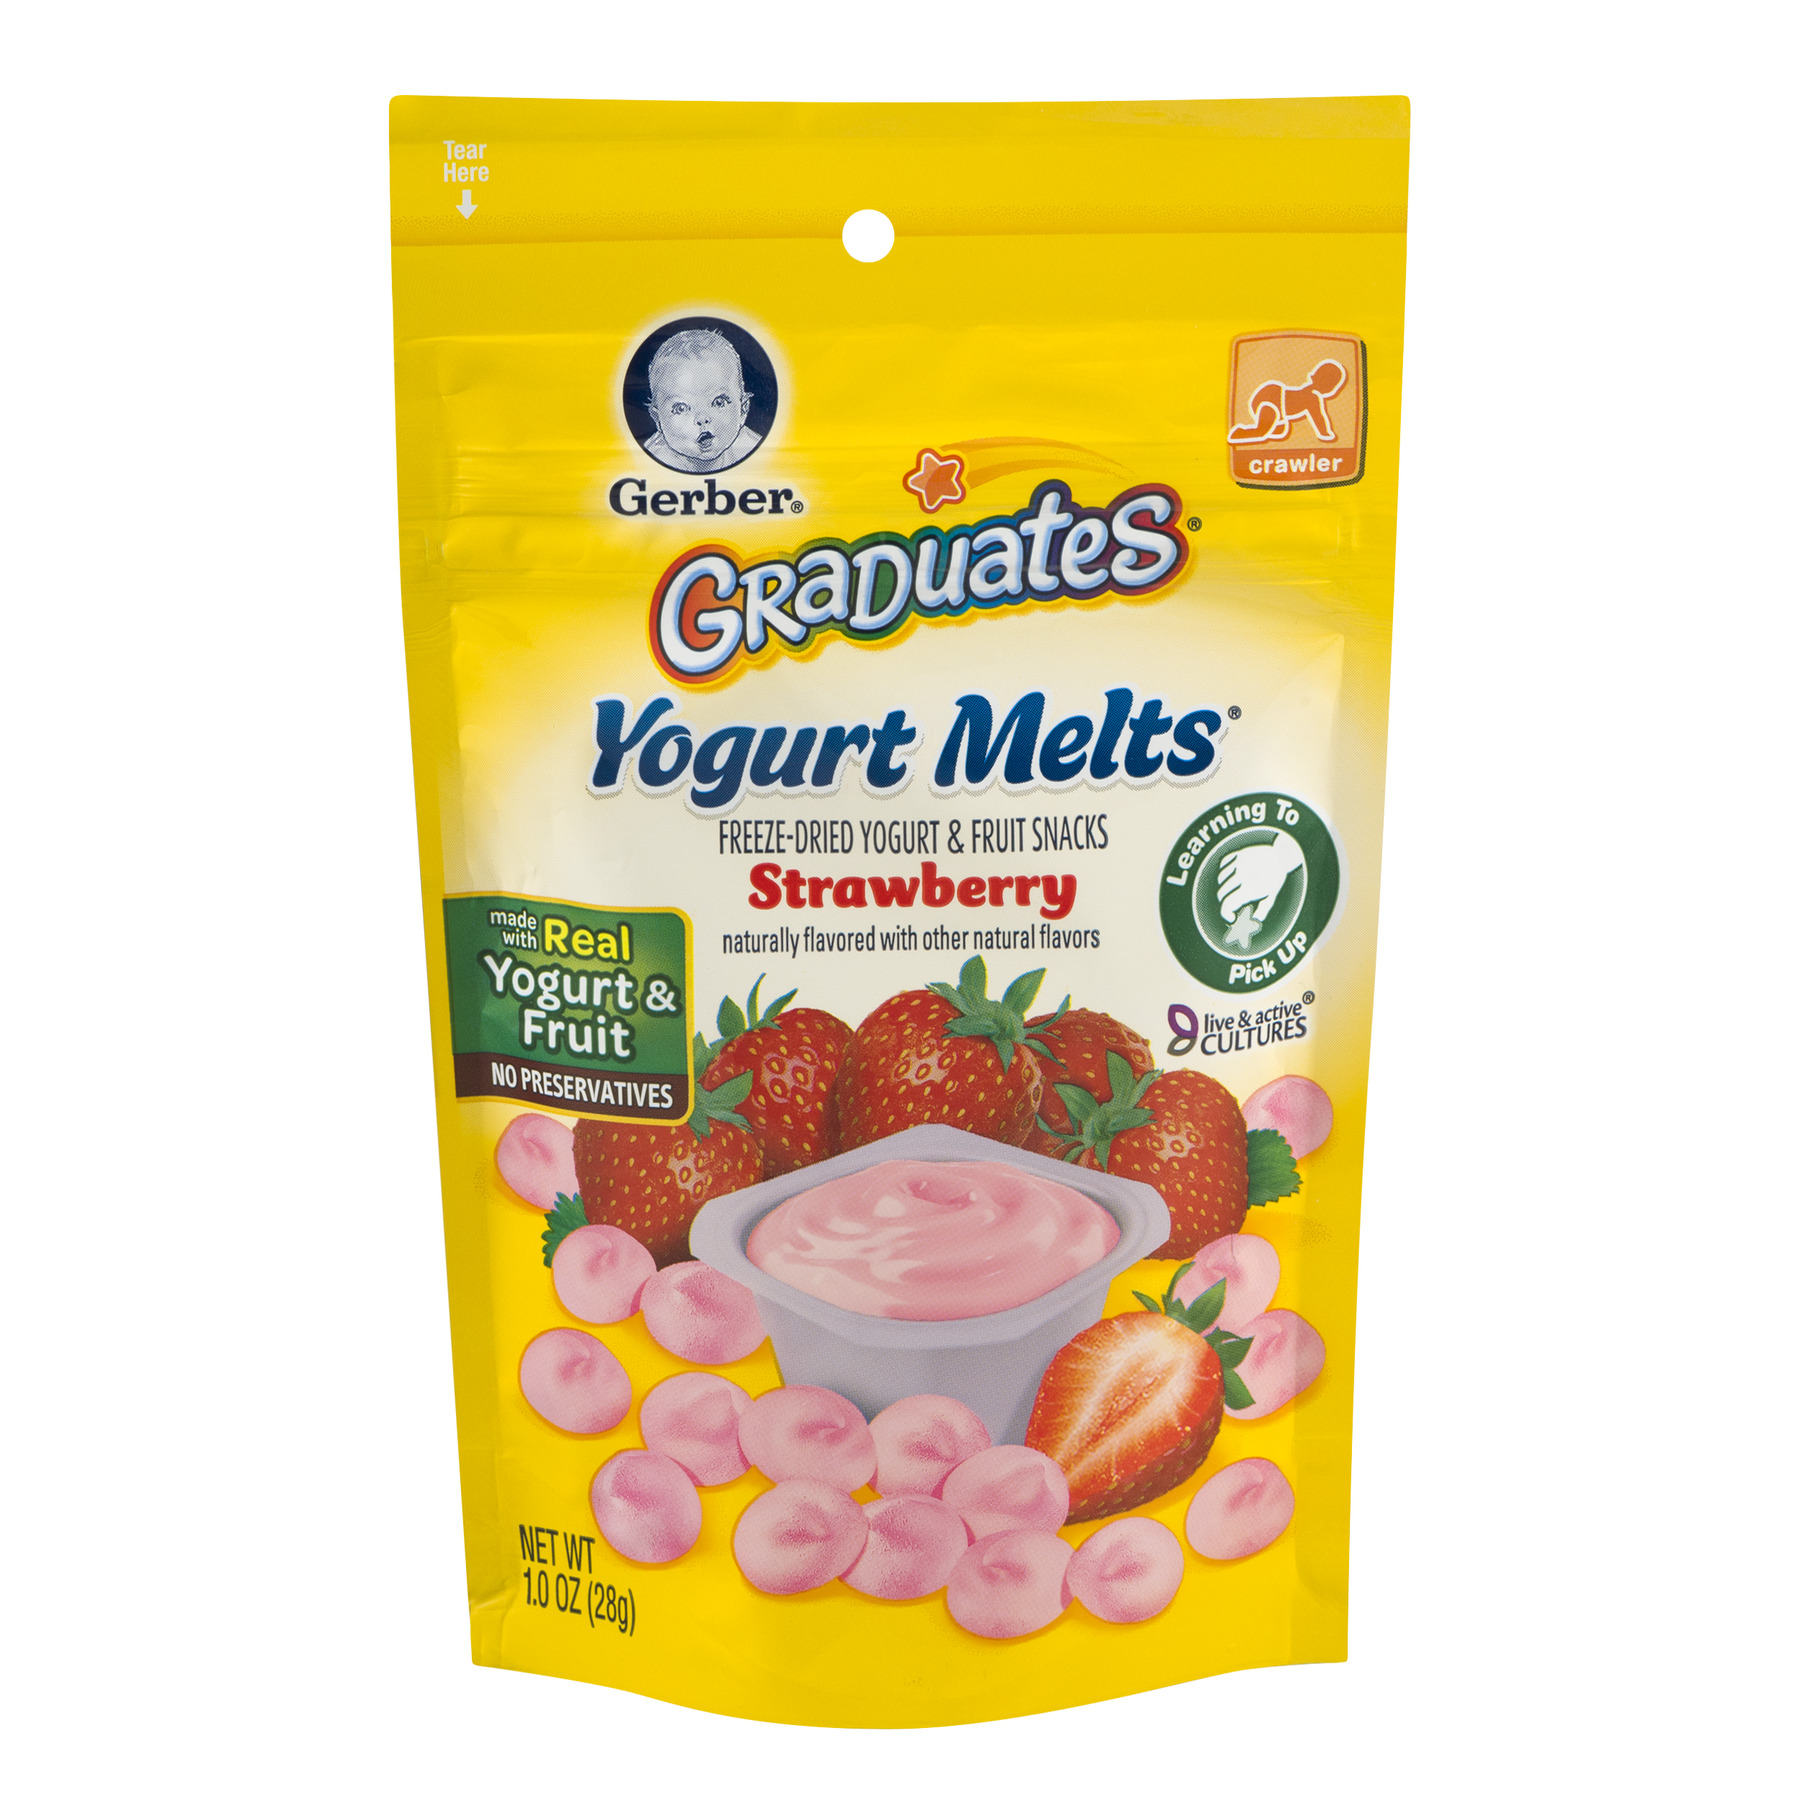 Gerber Graduates Yogurt Melts Freeze-Dried Yogurt & Fruit Snacks Strawberry, 1.0 OZ